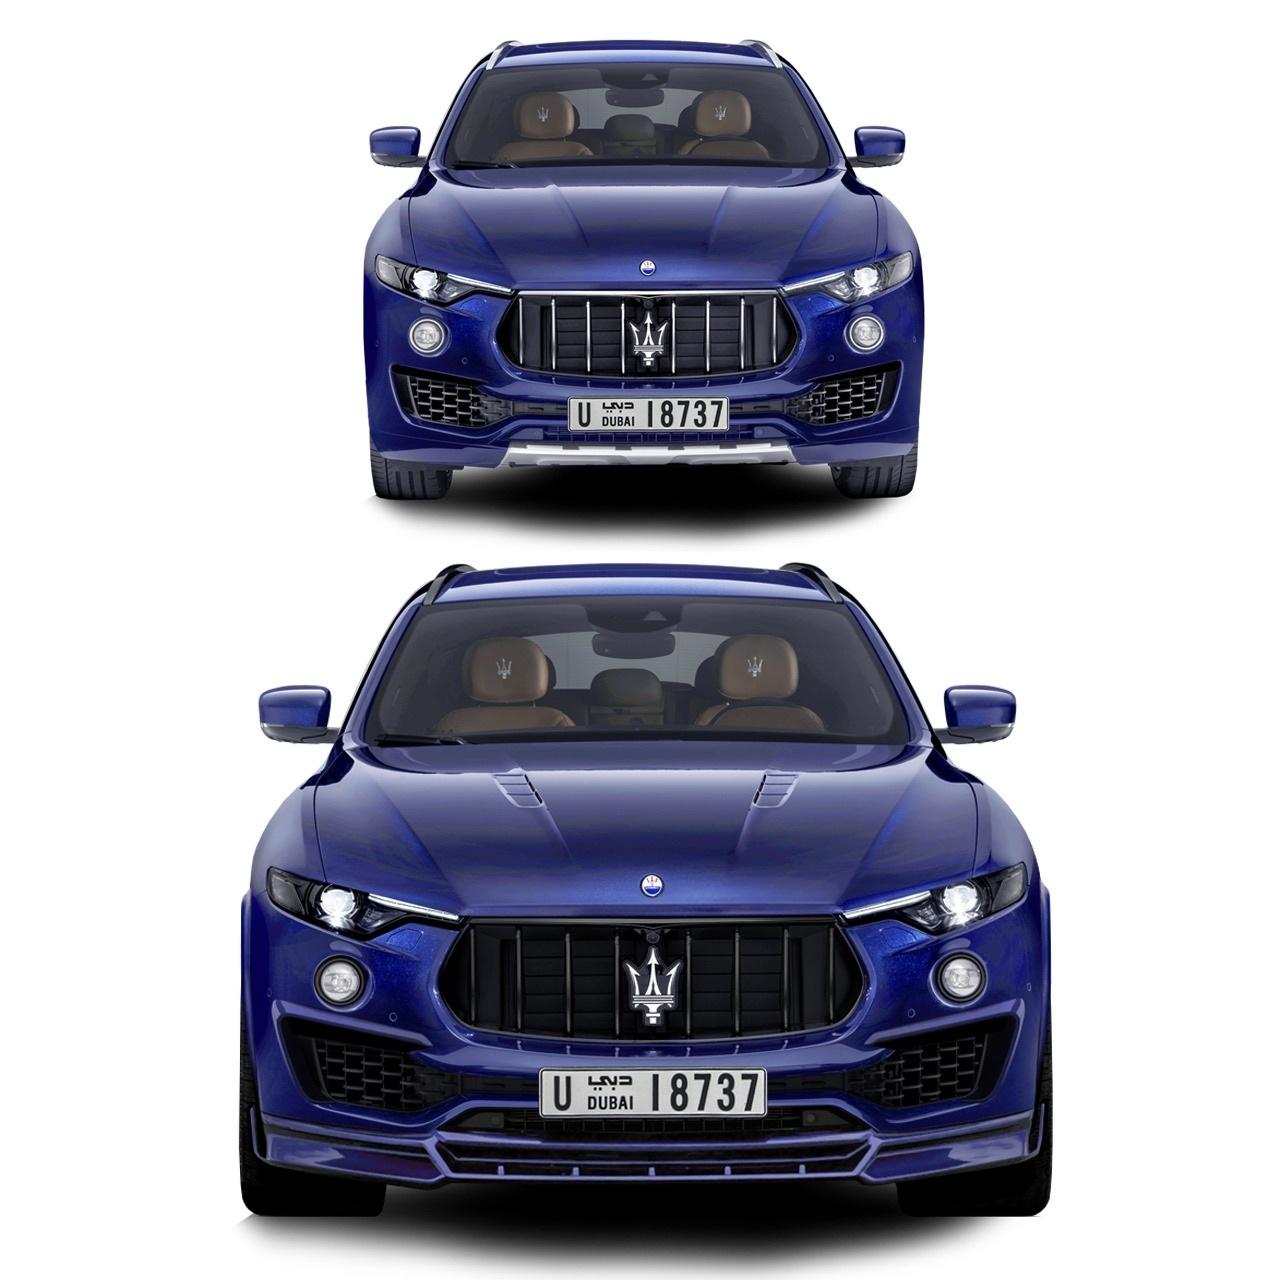 Renegade body kit for Maserati Levante new model